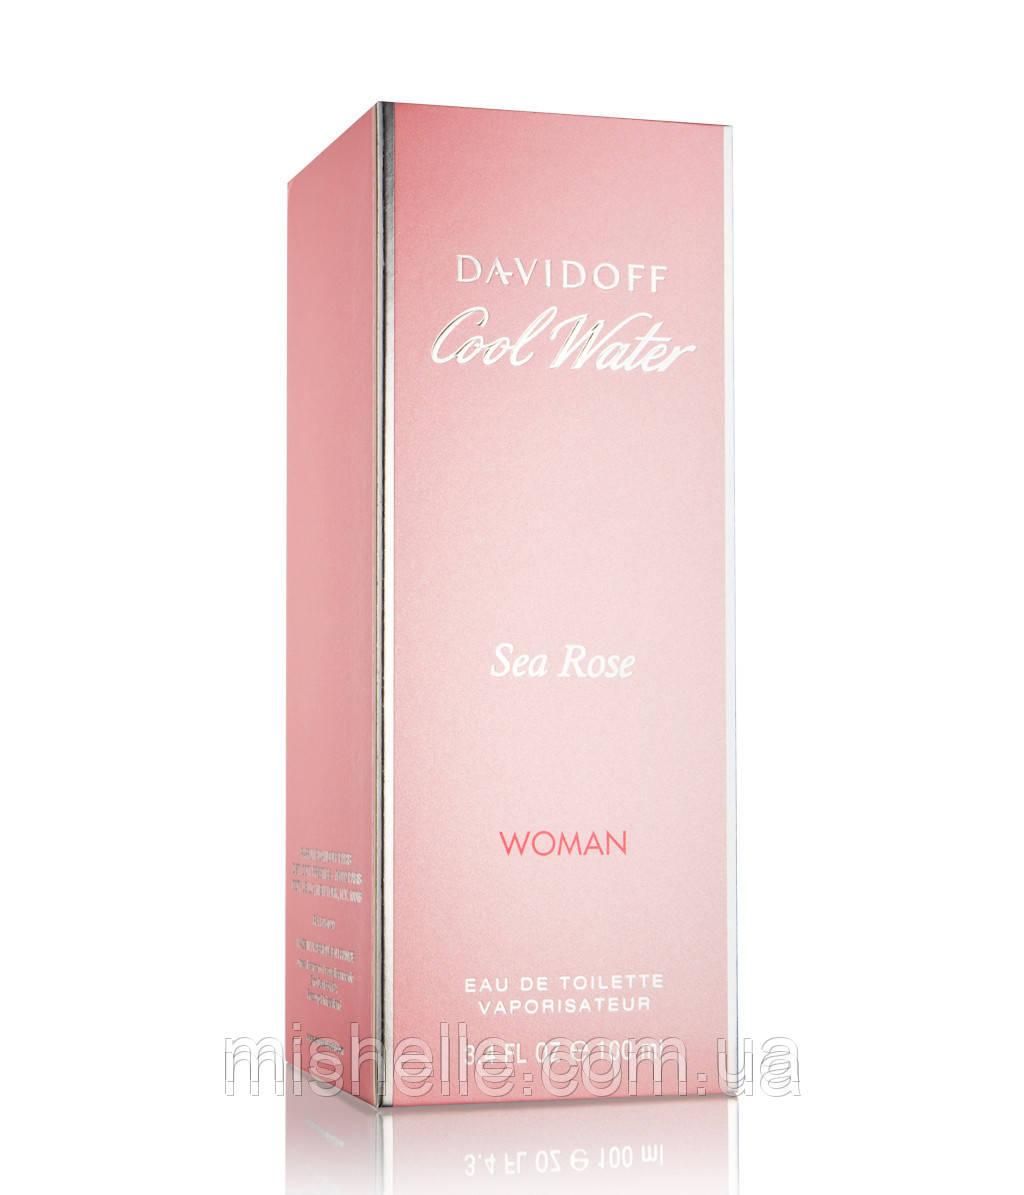 Туалетная вода для женщин Davidoff  Cool Water Sea Rose (Давидофф Кул Вотер Роуз) реплика